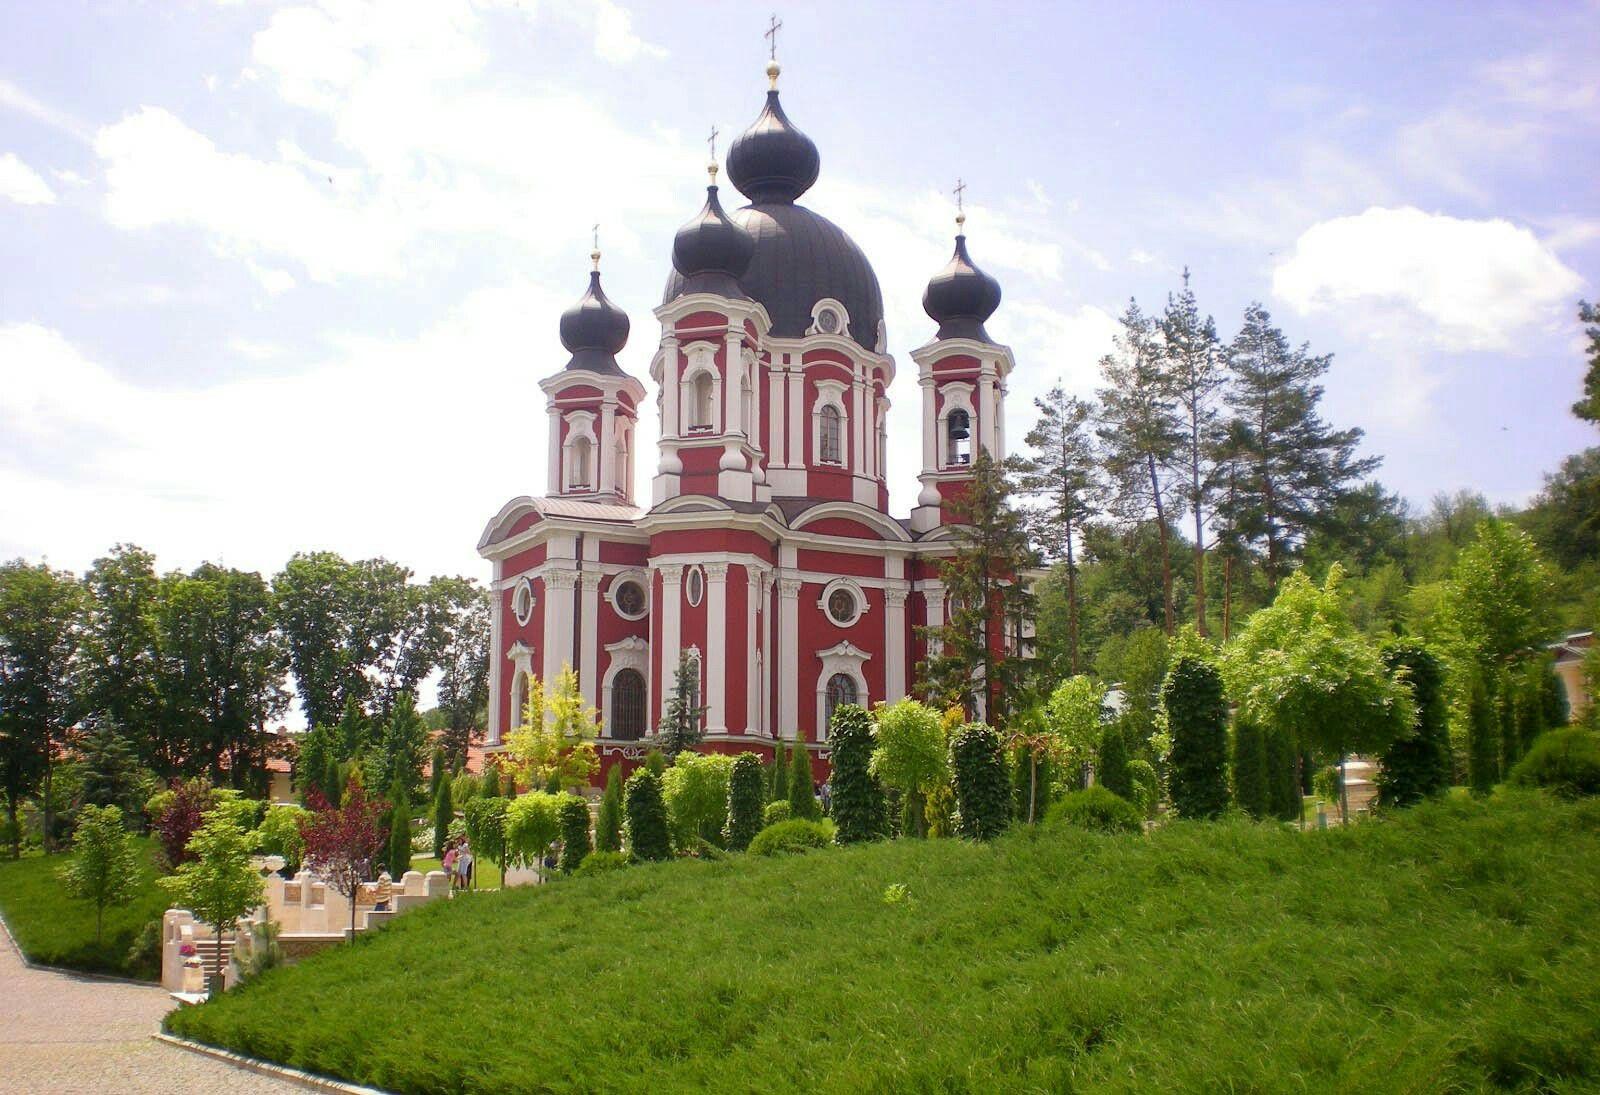 Manastirea Curchi. Monastery in Moldova. | Cool places to visit, Places to  visit, Monastery